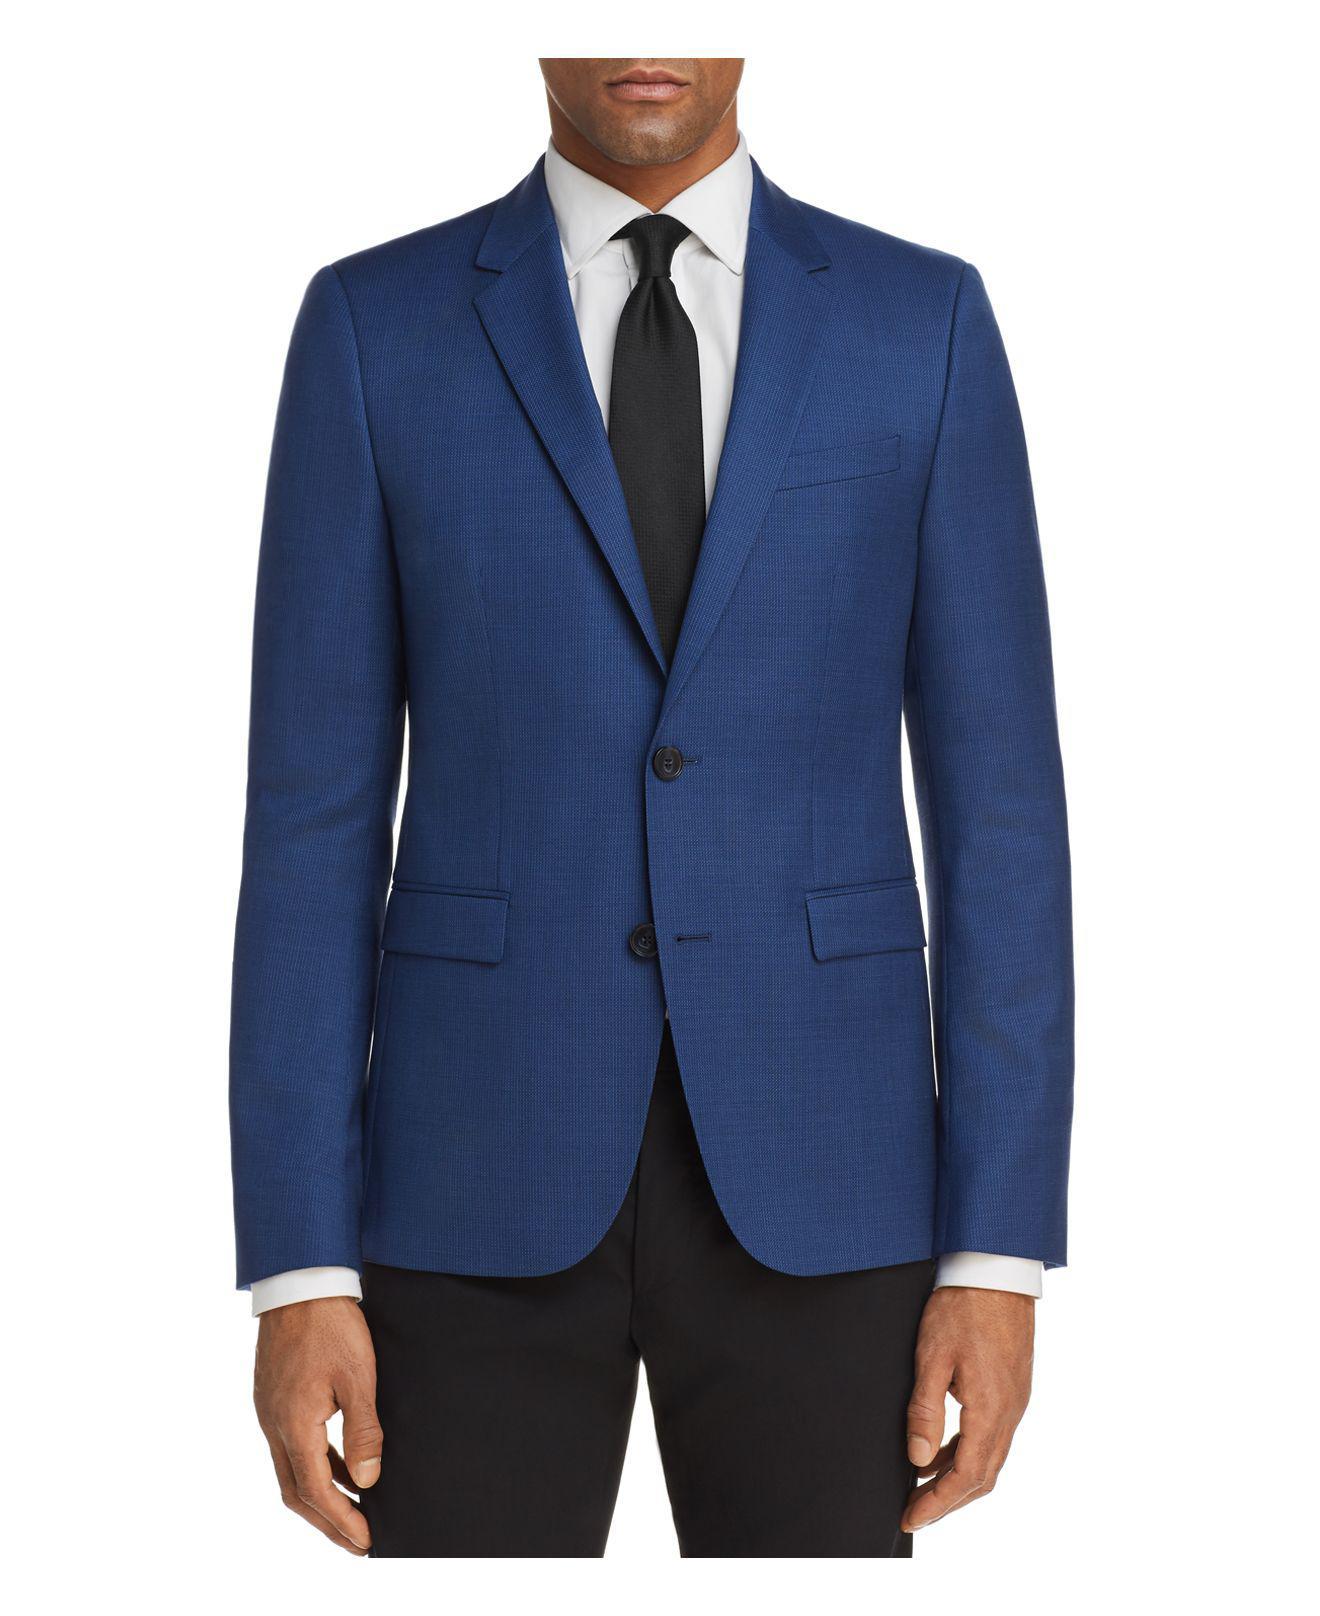 HUGO. Men's Blue Astian Slim Fit Nailshead Suit Separates Jacket